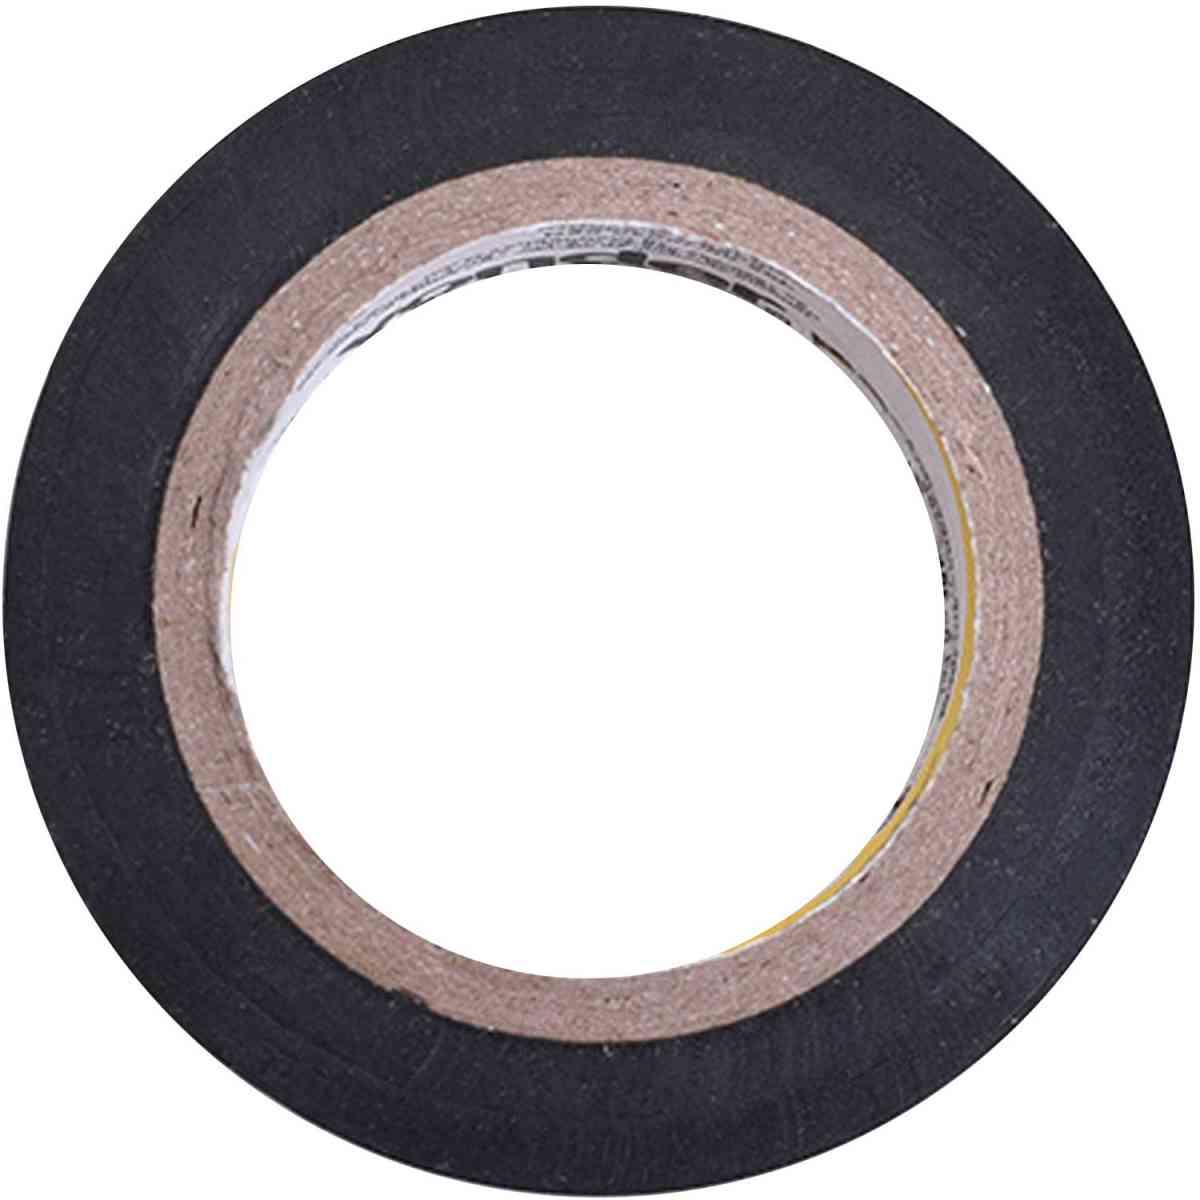 Fita Isolante 19 mm X 5 m Preta Vonder